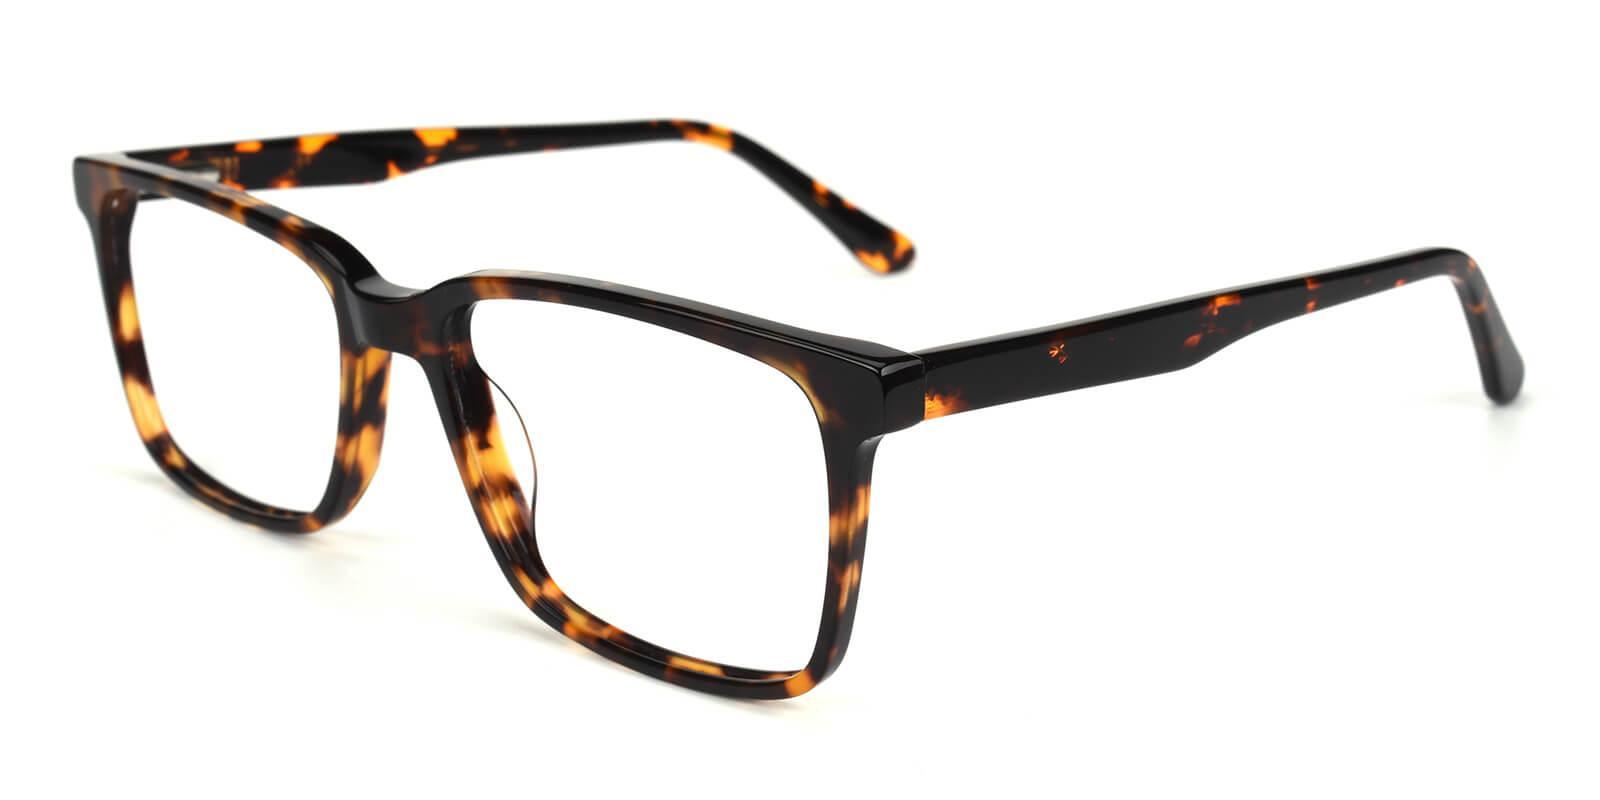 Sakou-Tortoise-Square-Acetate-Eyeglasses-additional1